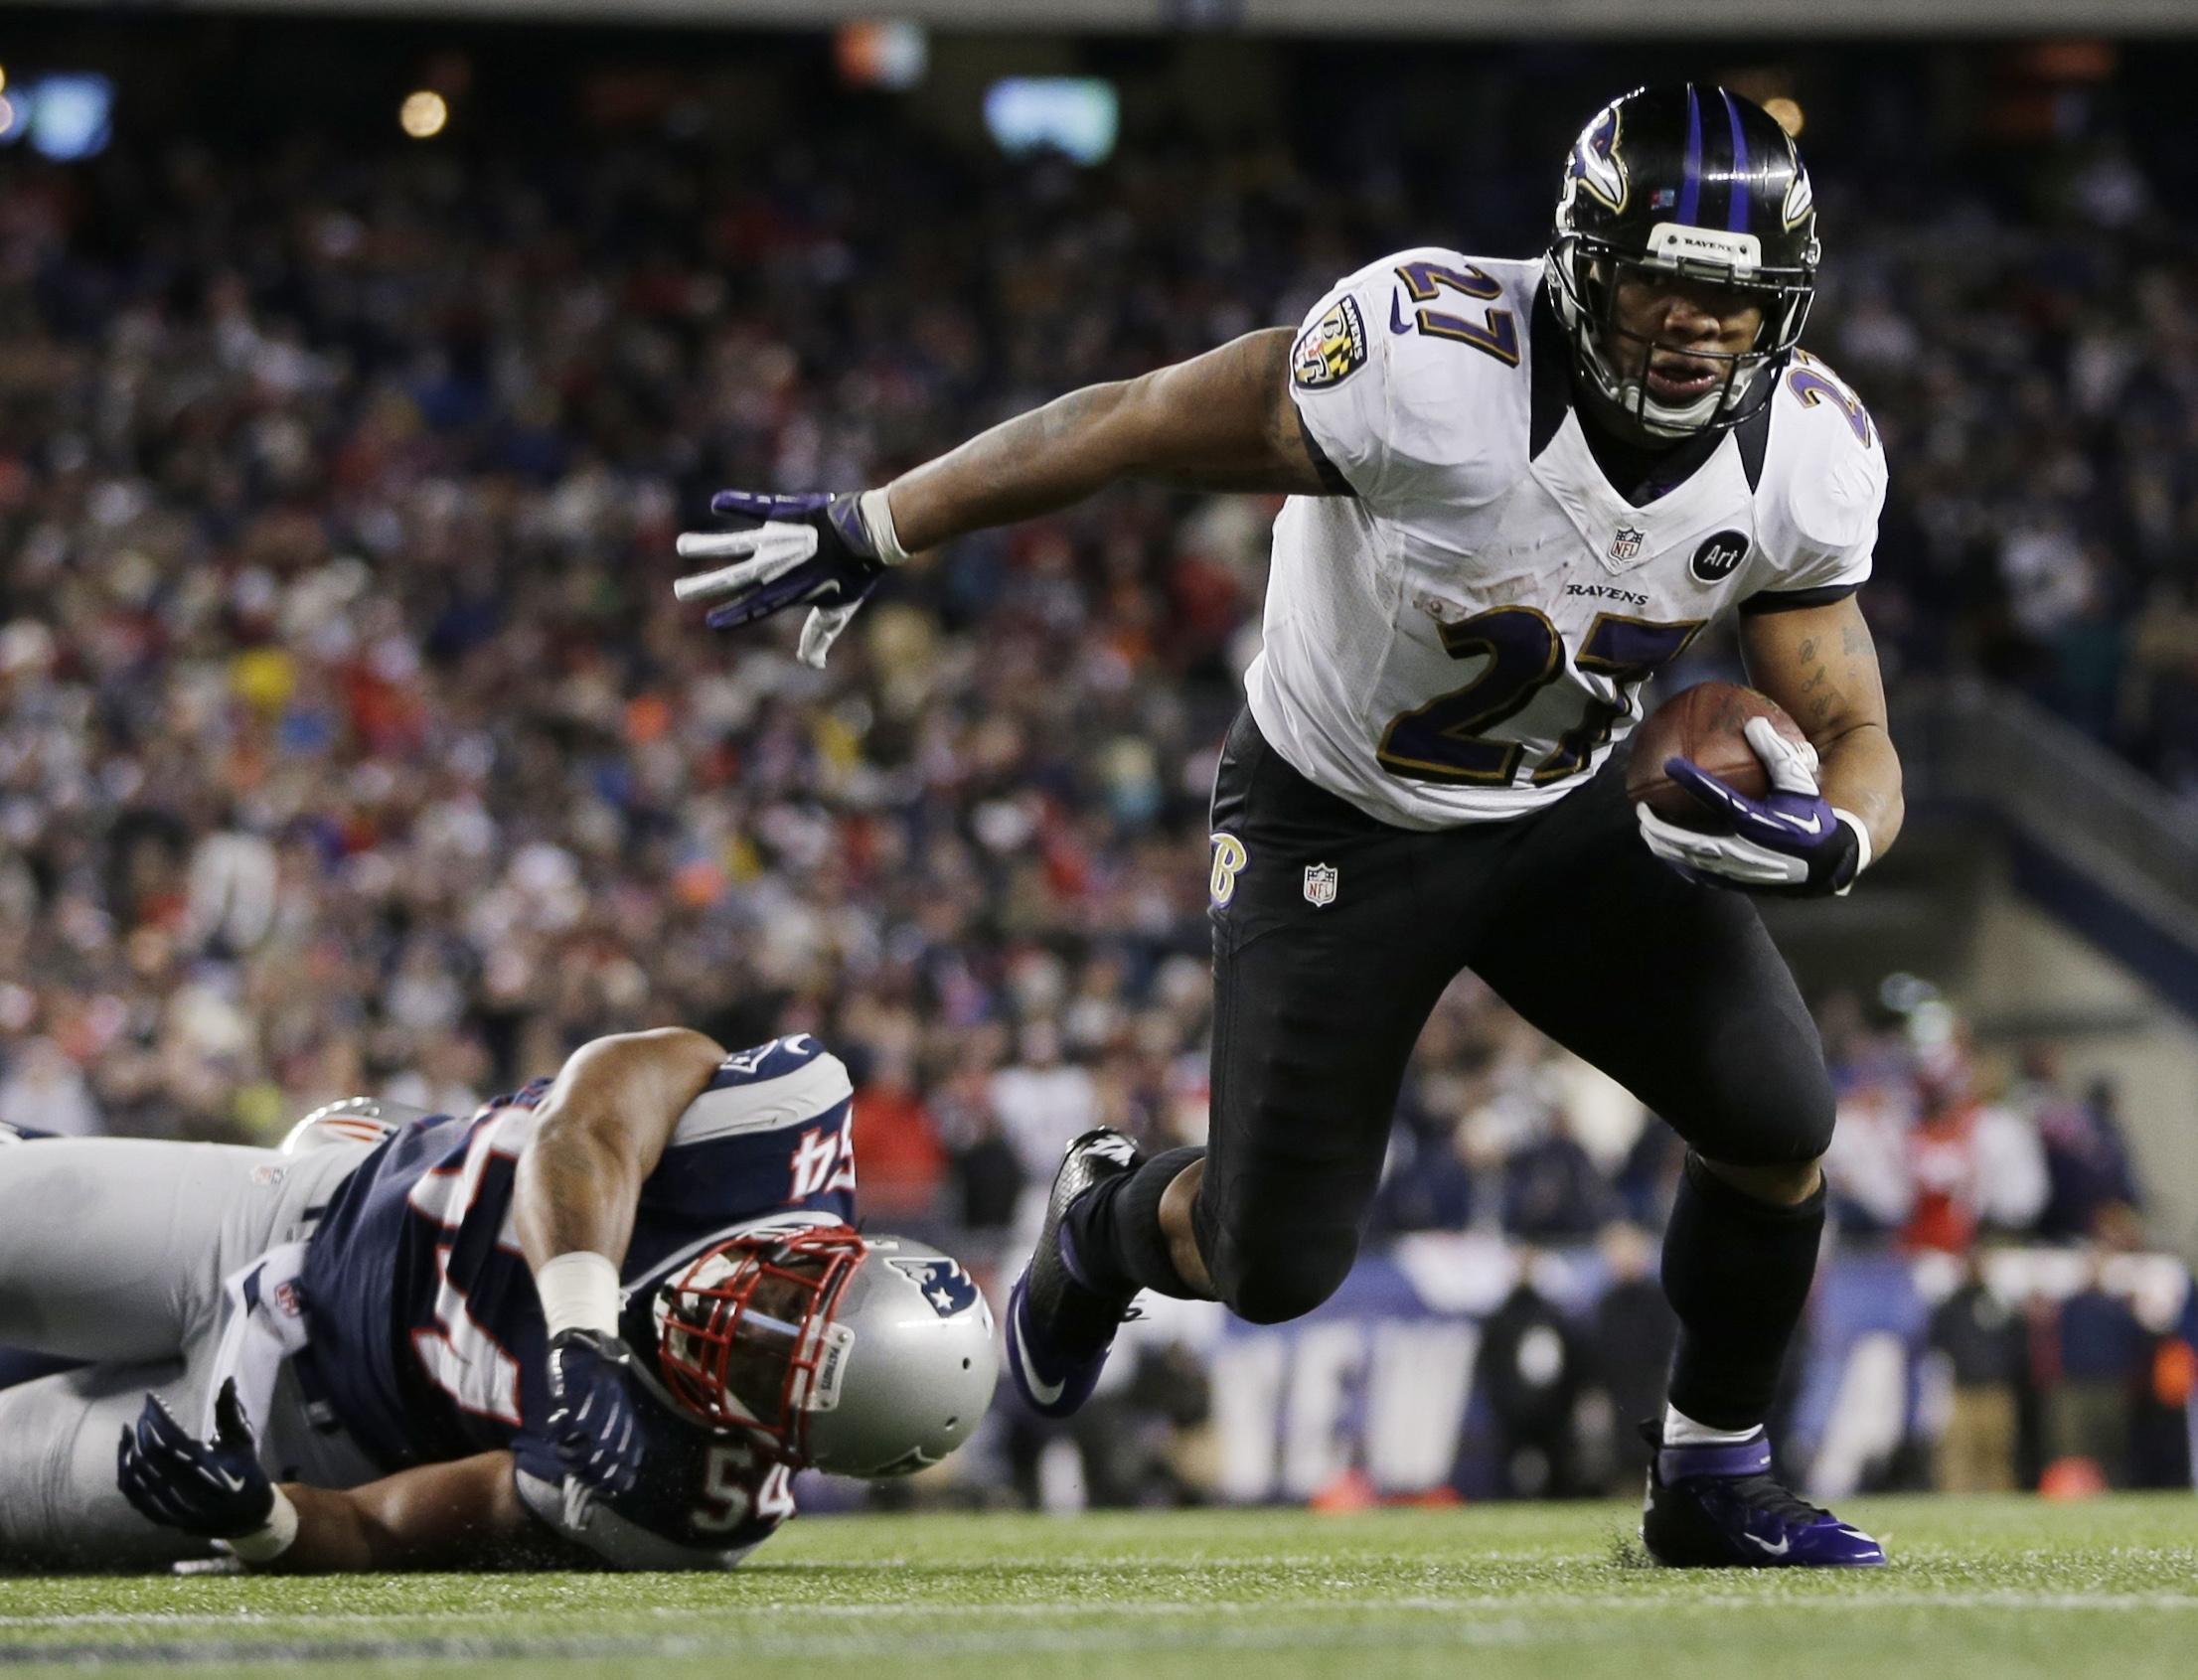 A strained hip flexor muscle has limited Ravens running back Ray Rice. (AP Photo/Matt Slocum)